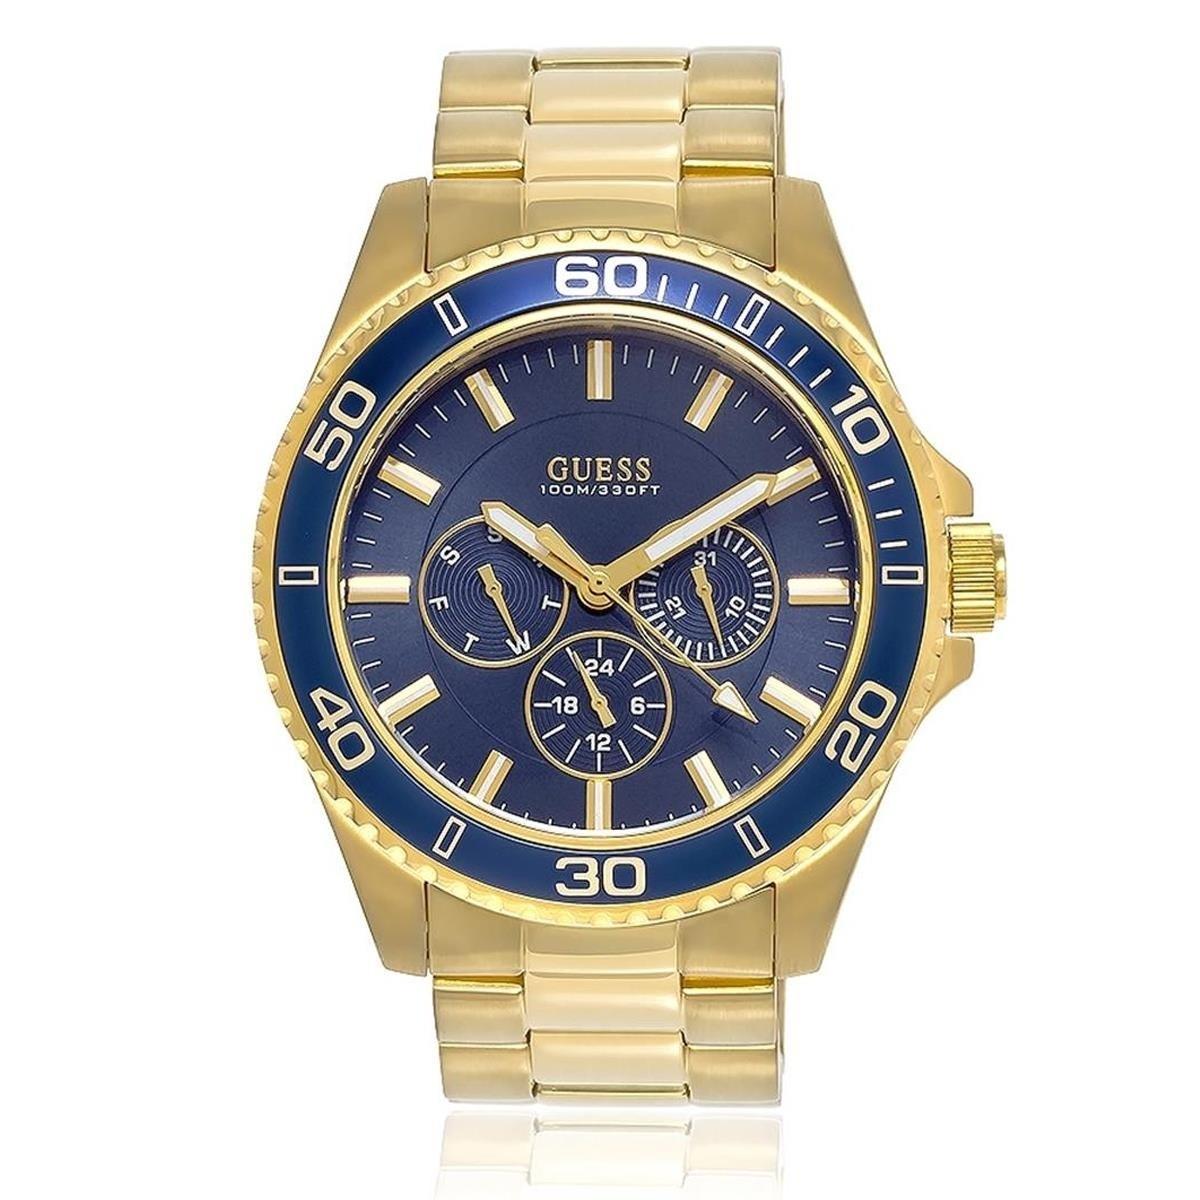 Relógio Guess Masculino - 92487GPGSDA5  - Dumont Online - Joias e Relógios